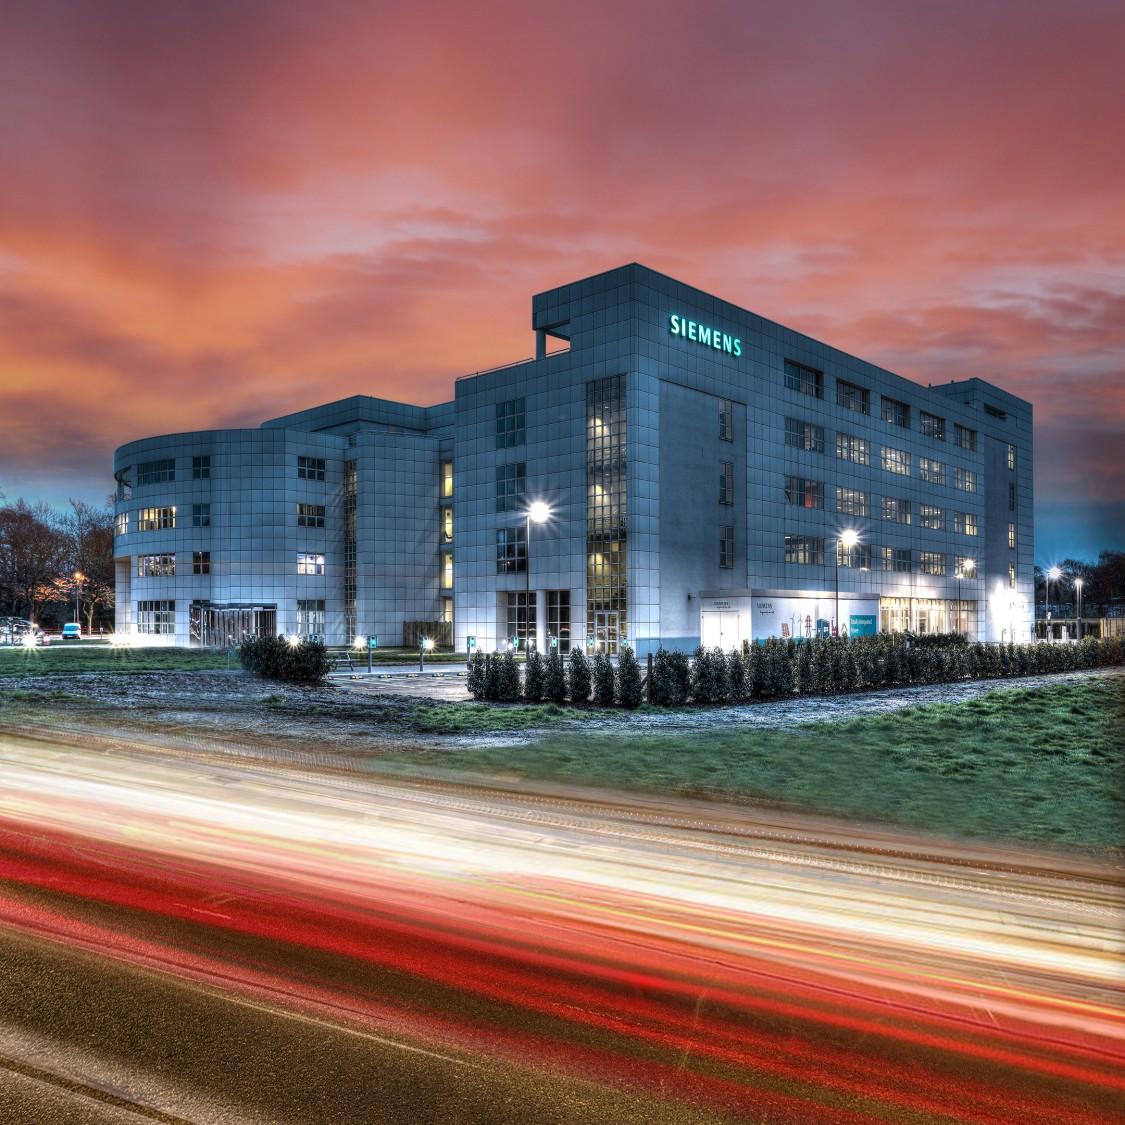 Siemens Manchester Office